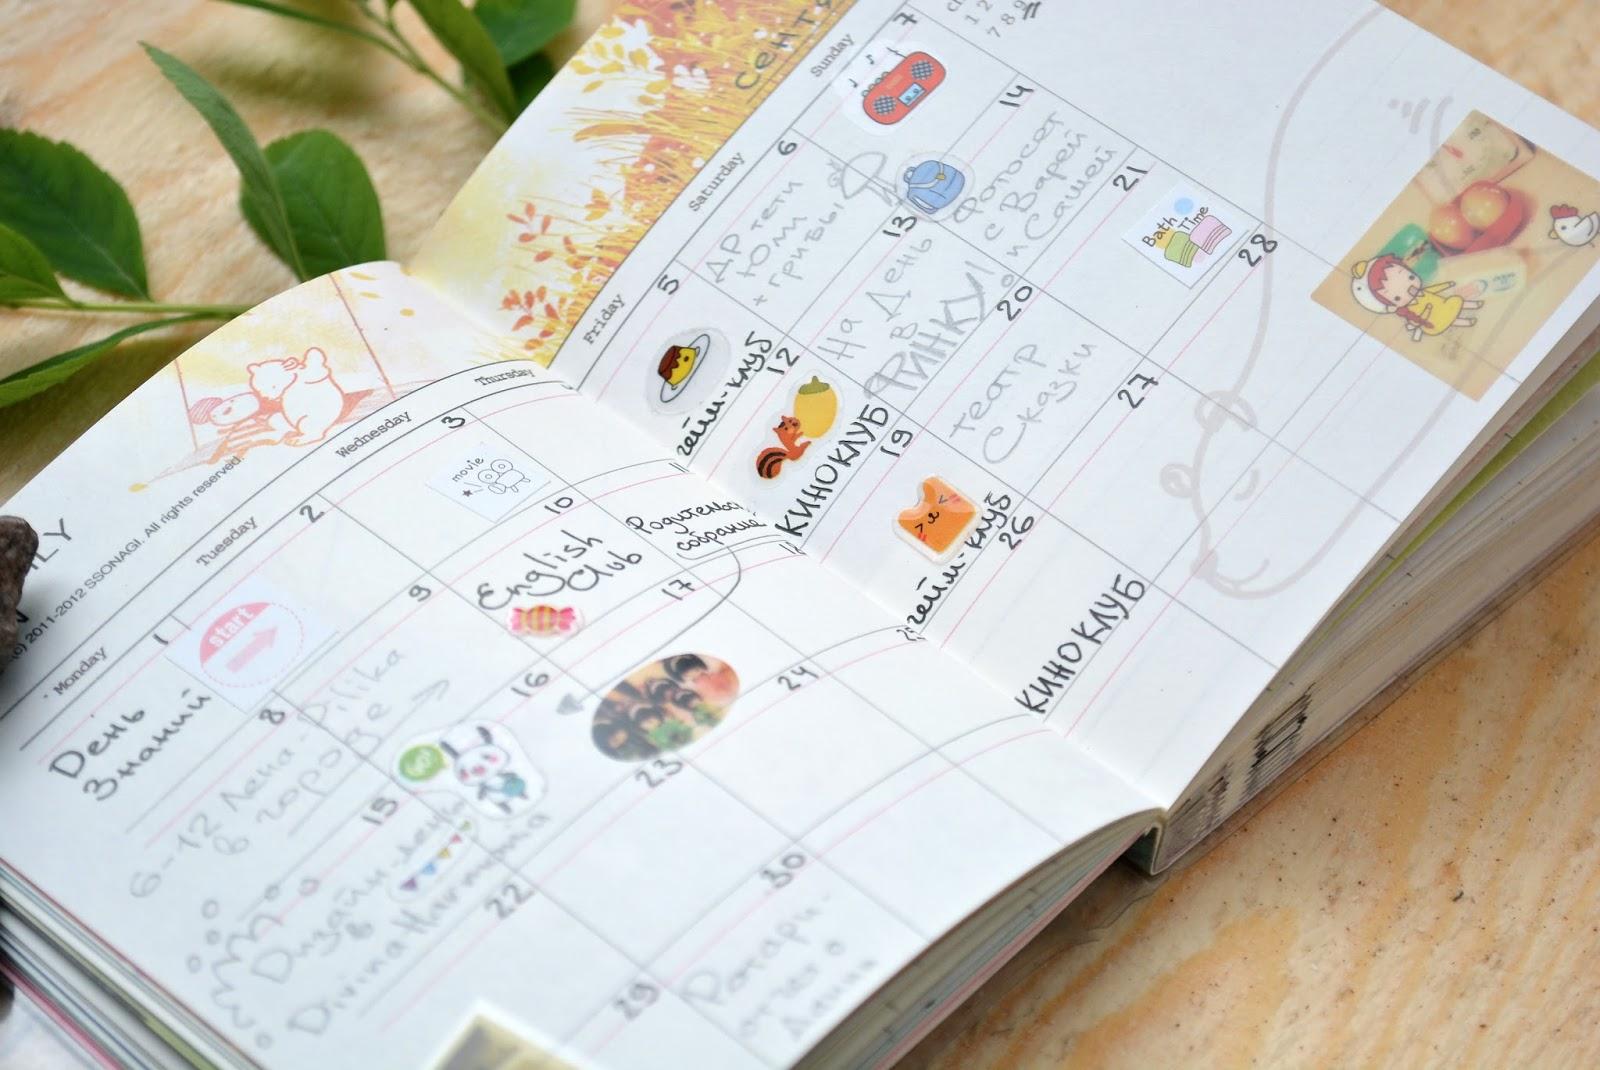 оформление ежедневника внутри фото